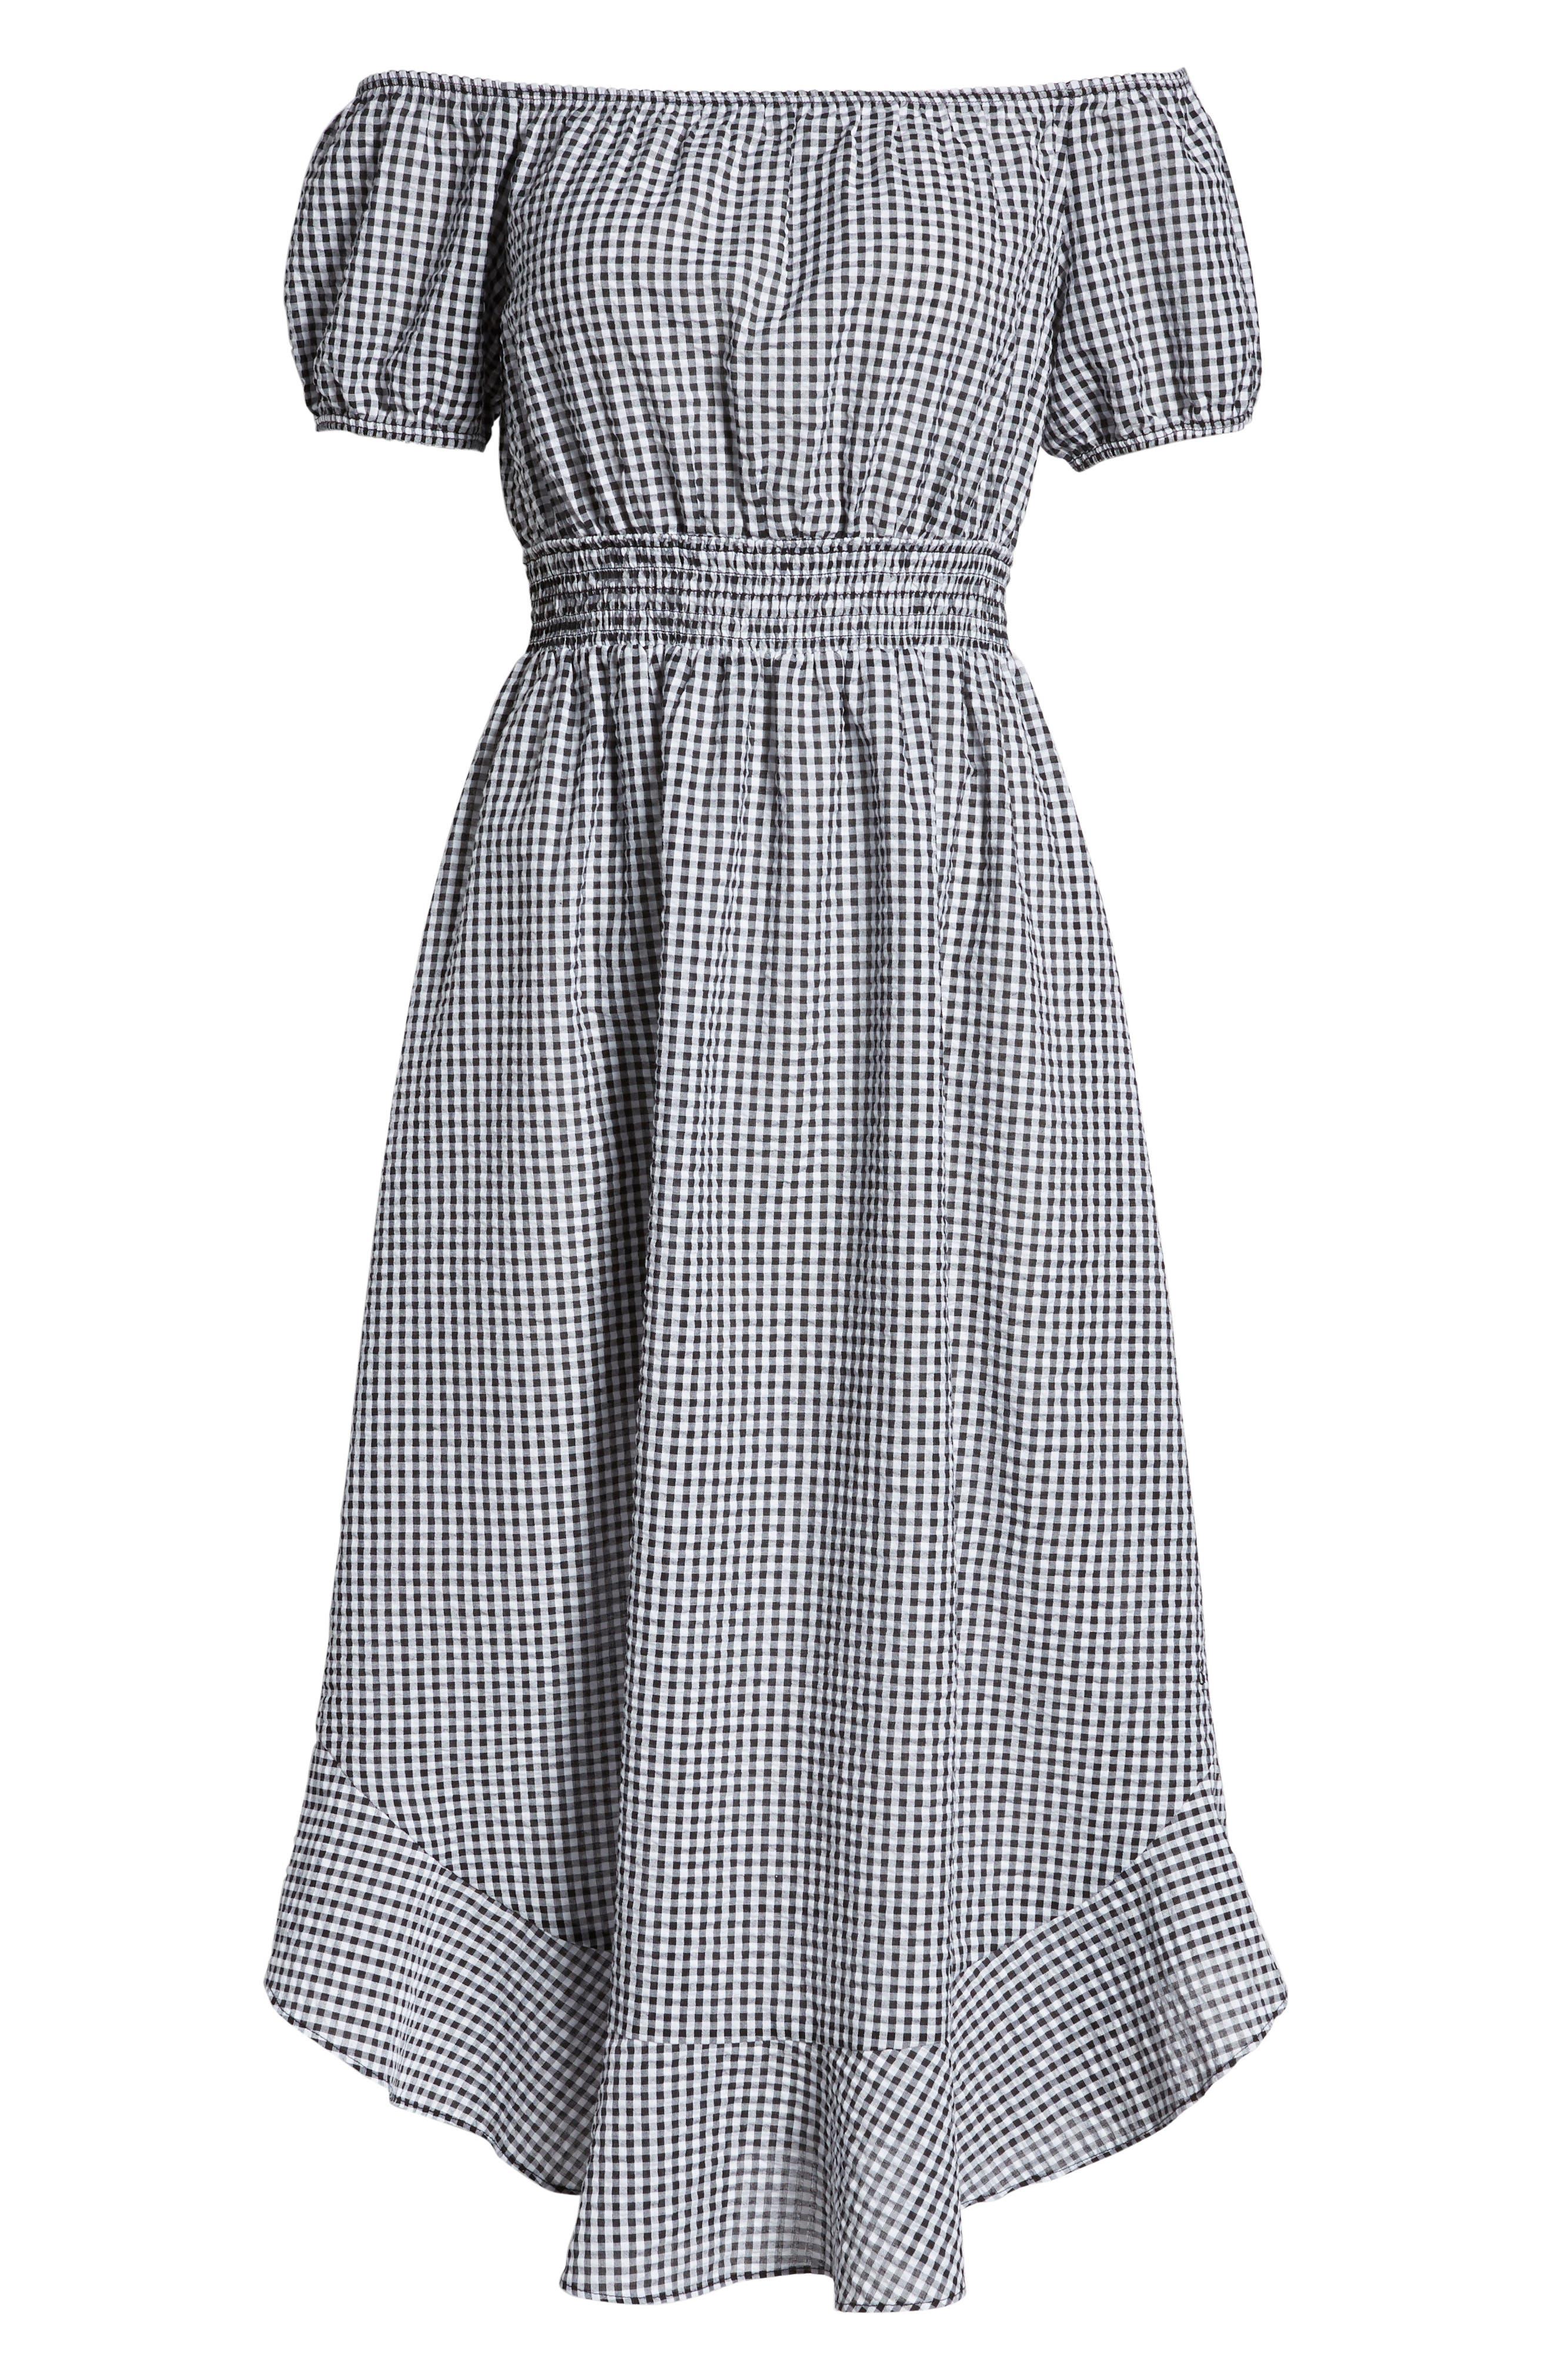 Gingham Off the Shoulder Dress,                             Alternate thumbnail 7, color,                             Black White Gingham